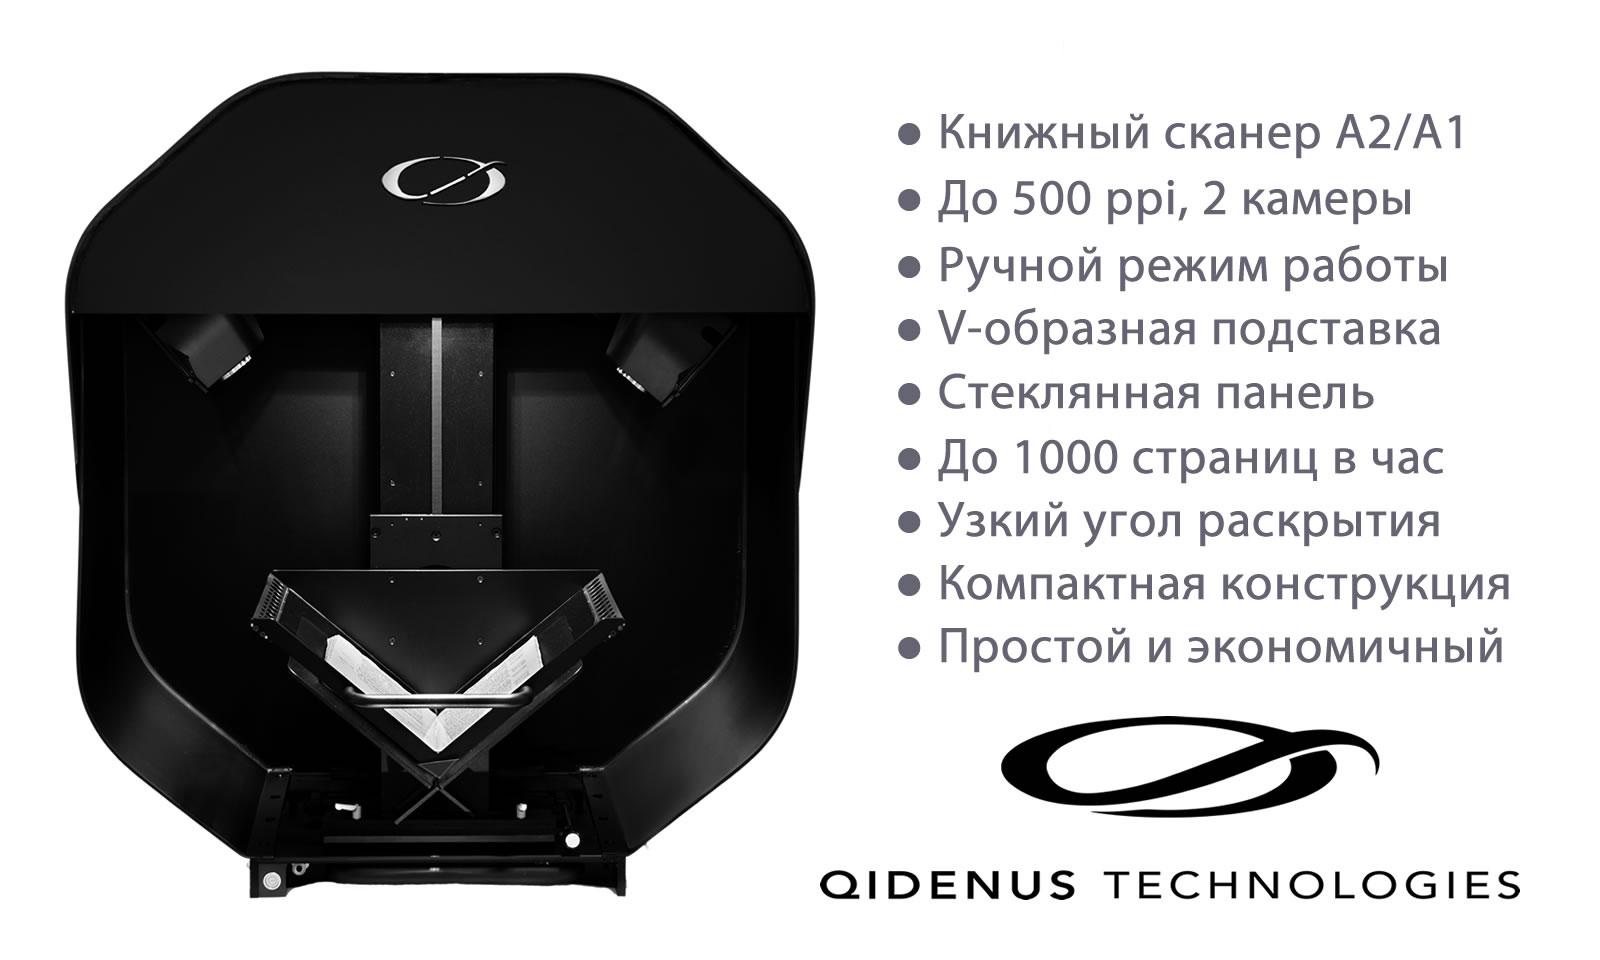 iGuana - New Qidenus Smart Book Scanner (Powered by iGuana) - RU